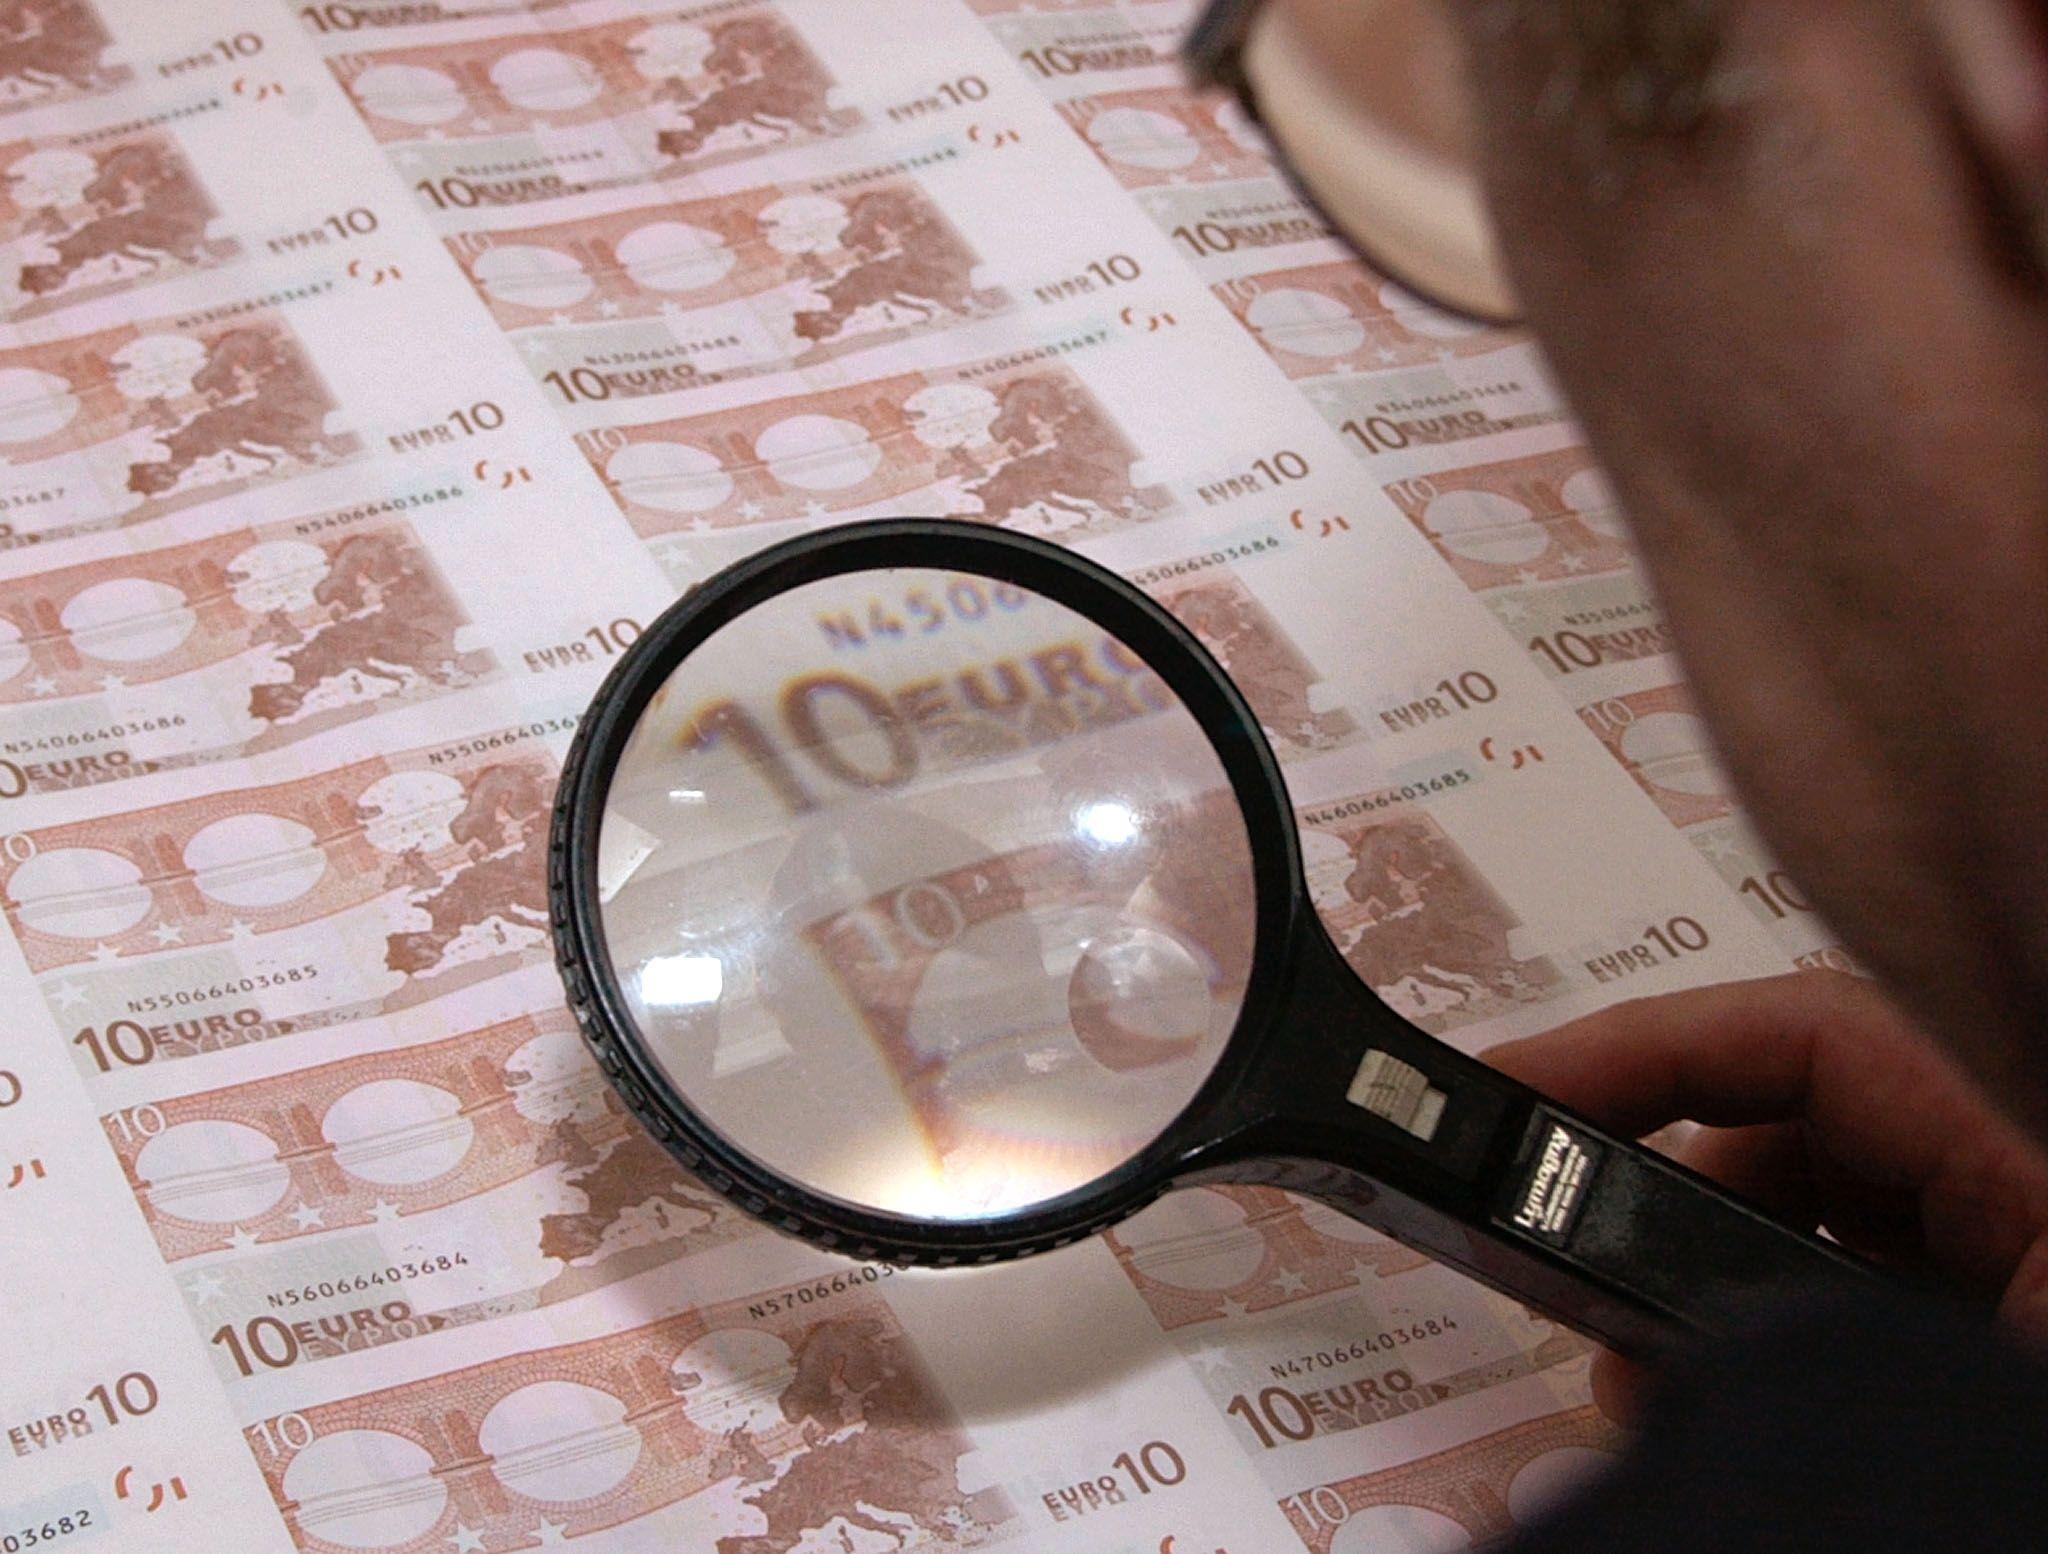 La fraude en France